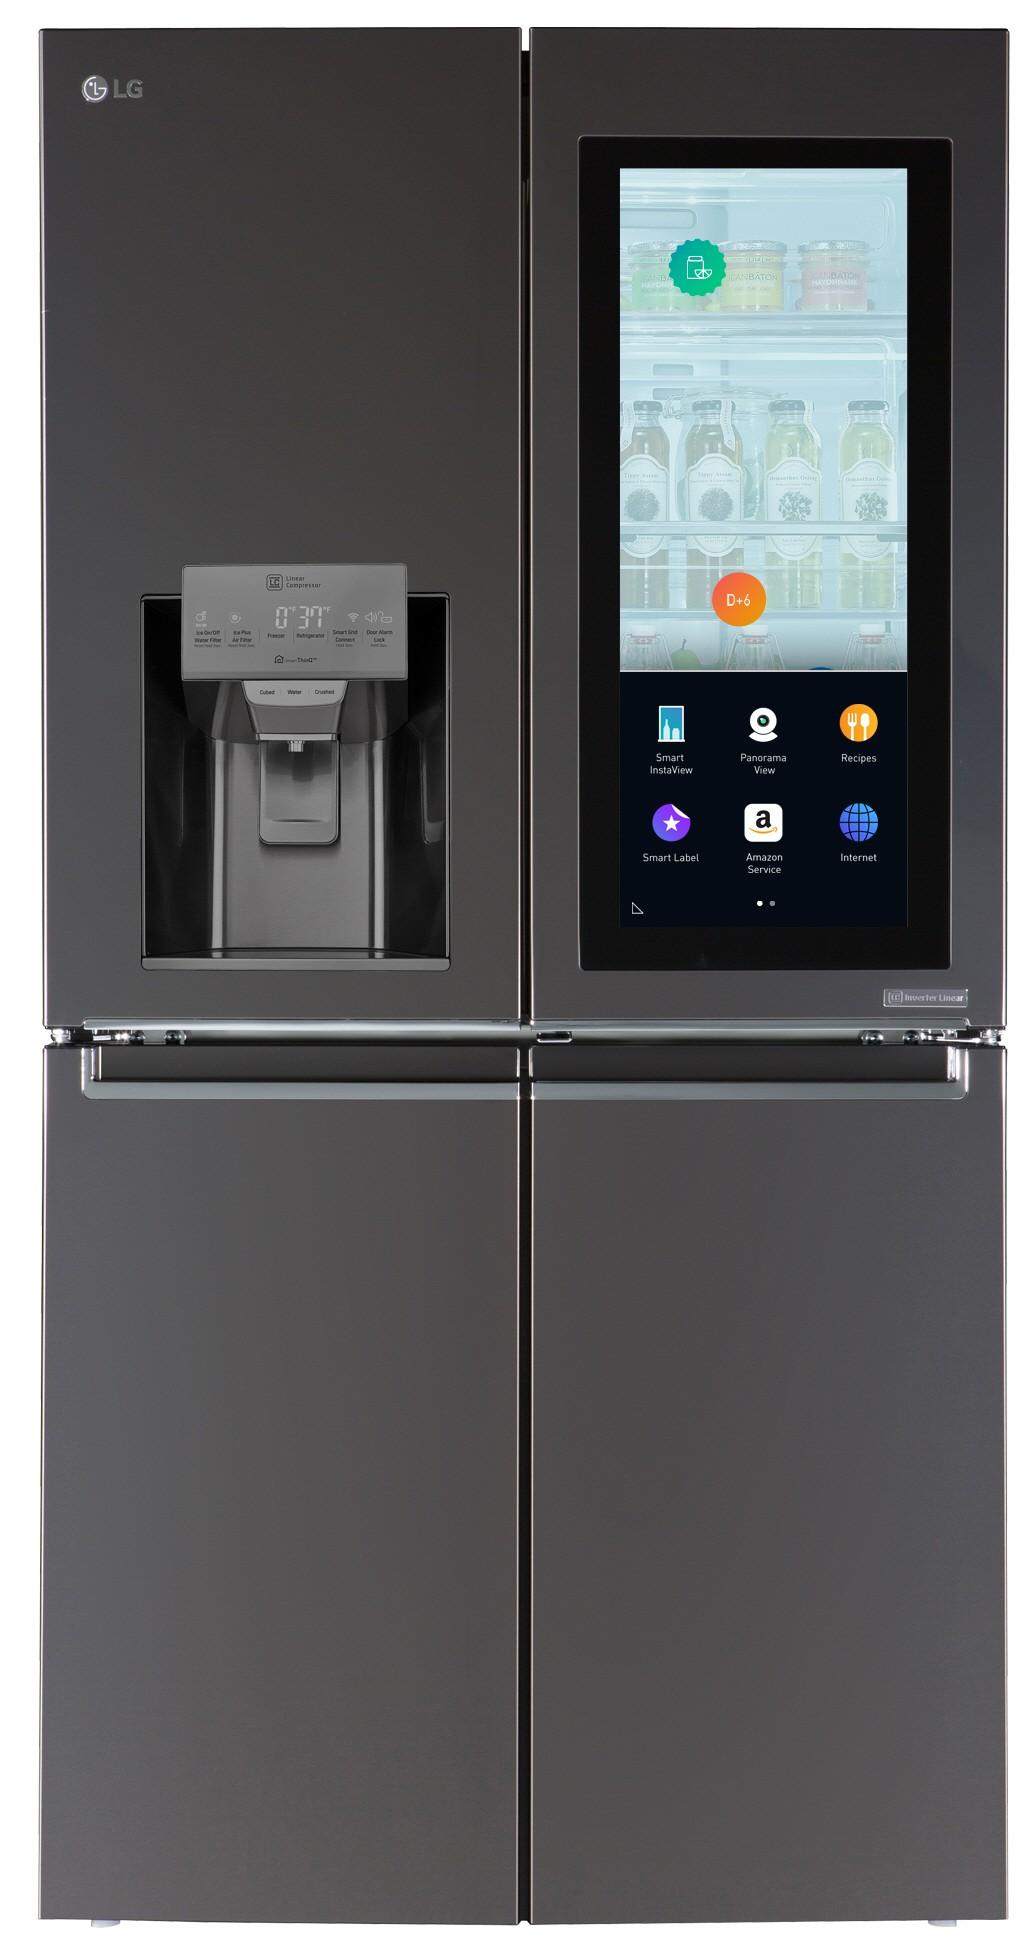 lg refrigerator instaview. lg-smart-instaview-refrigerator-02 lg refrigerator instaview